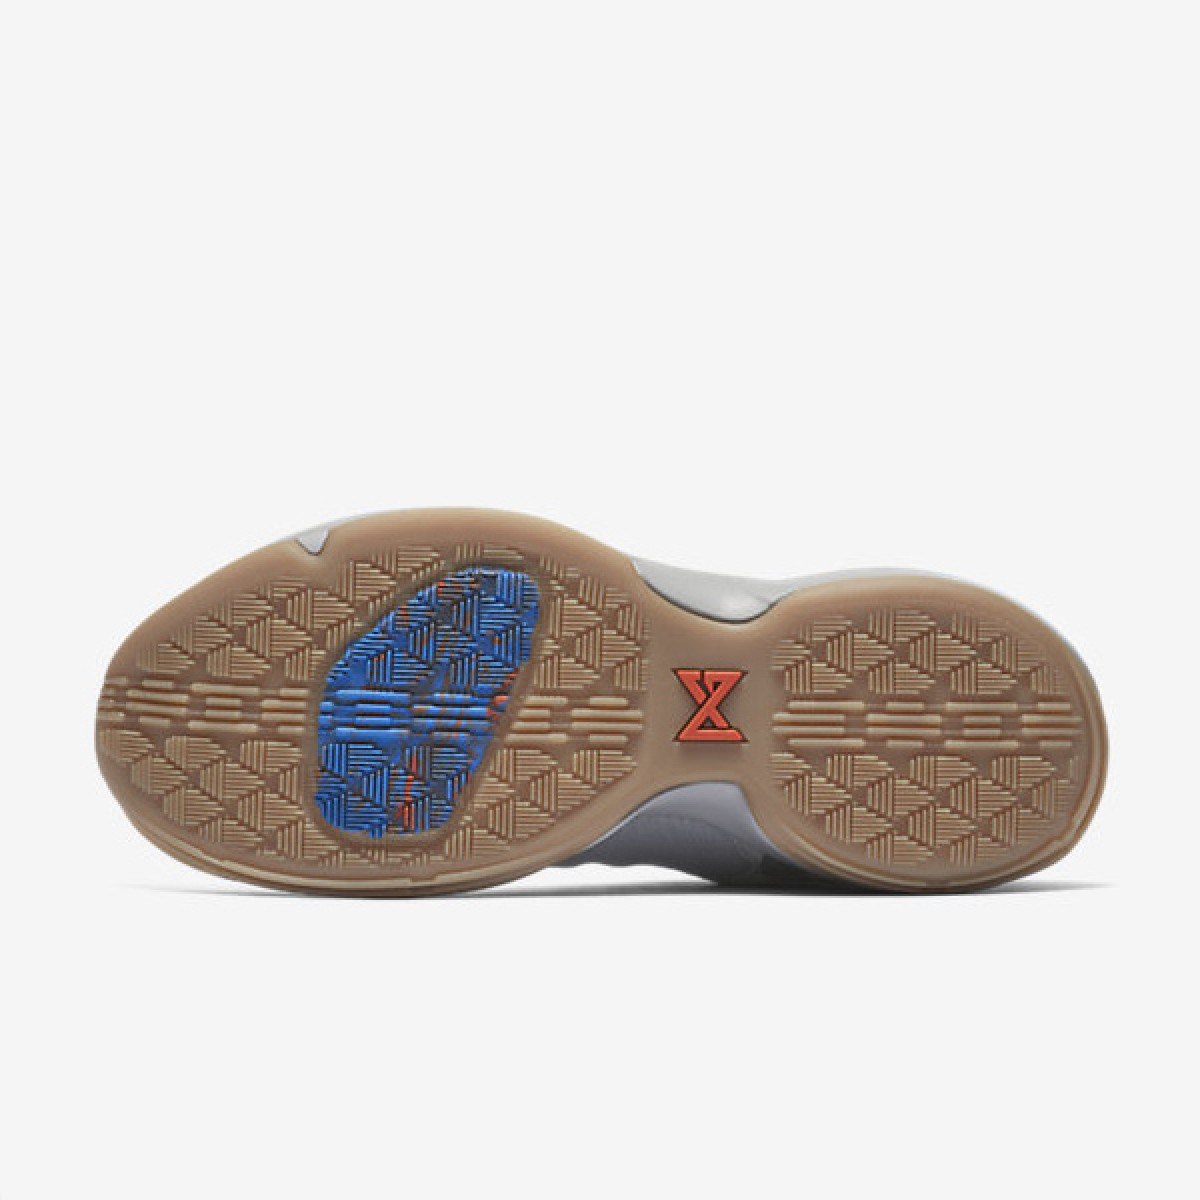 Nike PG 1 'Baseline' 878627-009